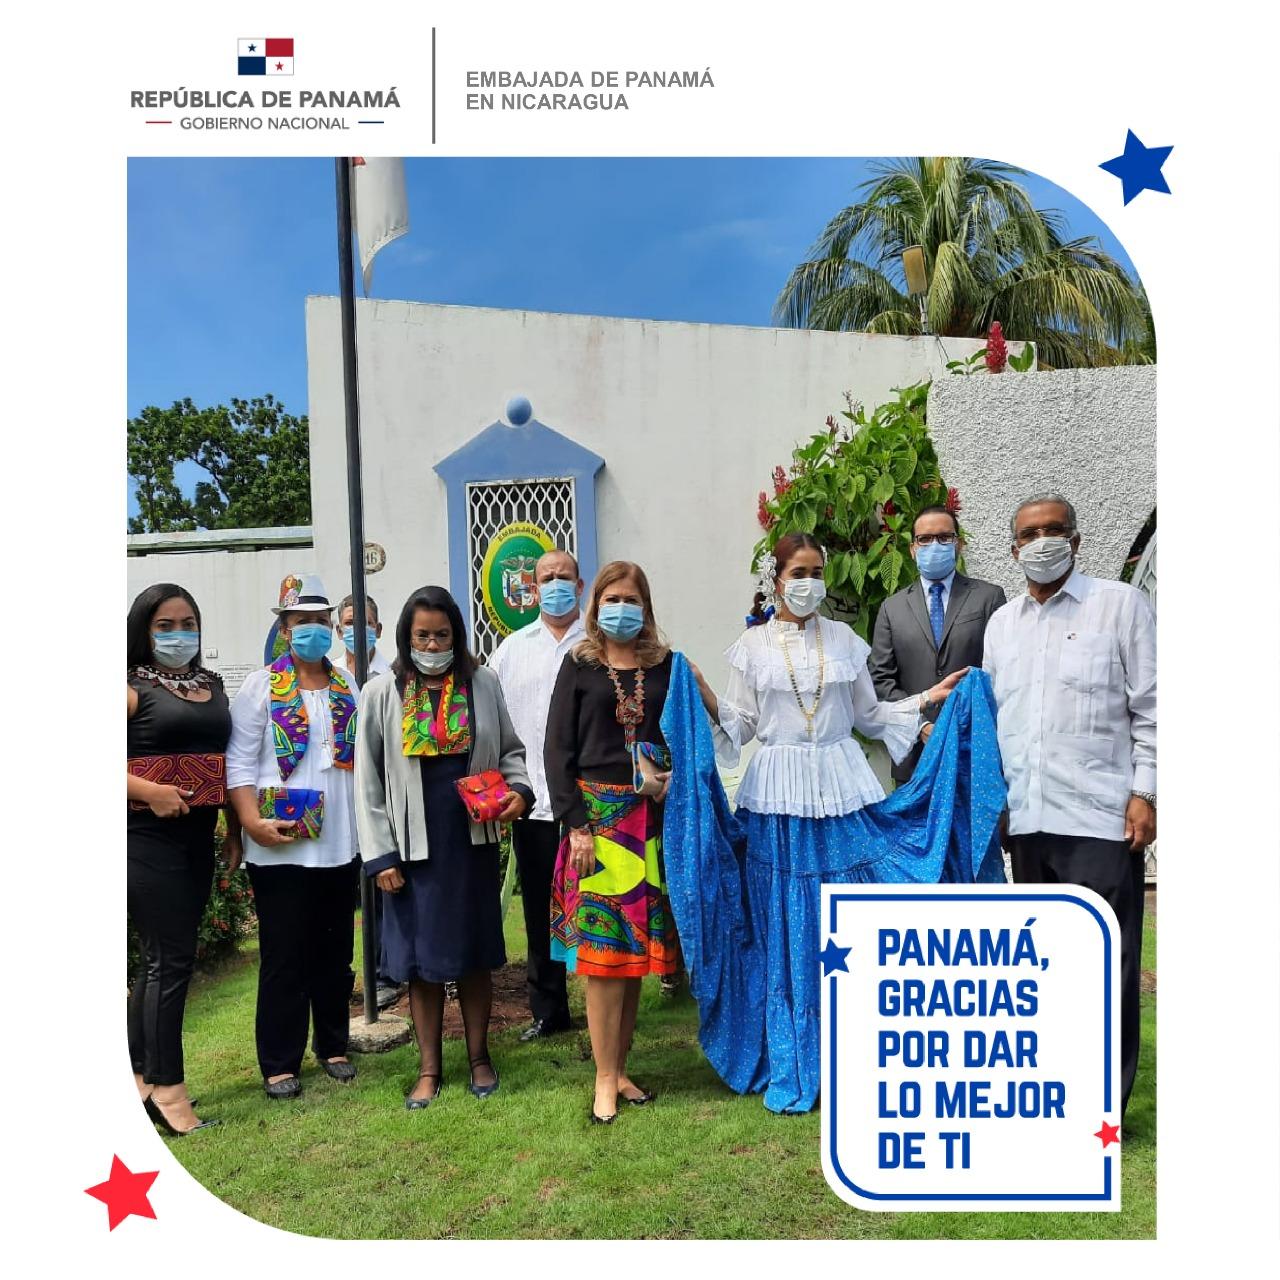 Embajada de Panamá en Nicaragua